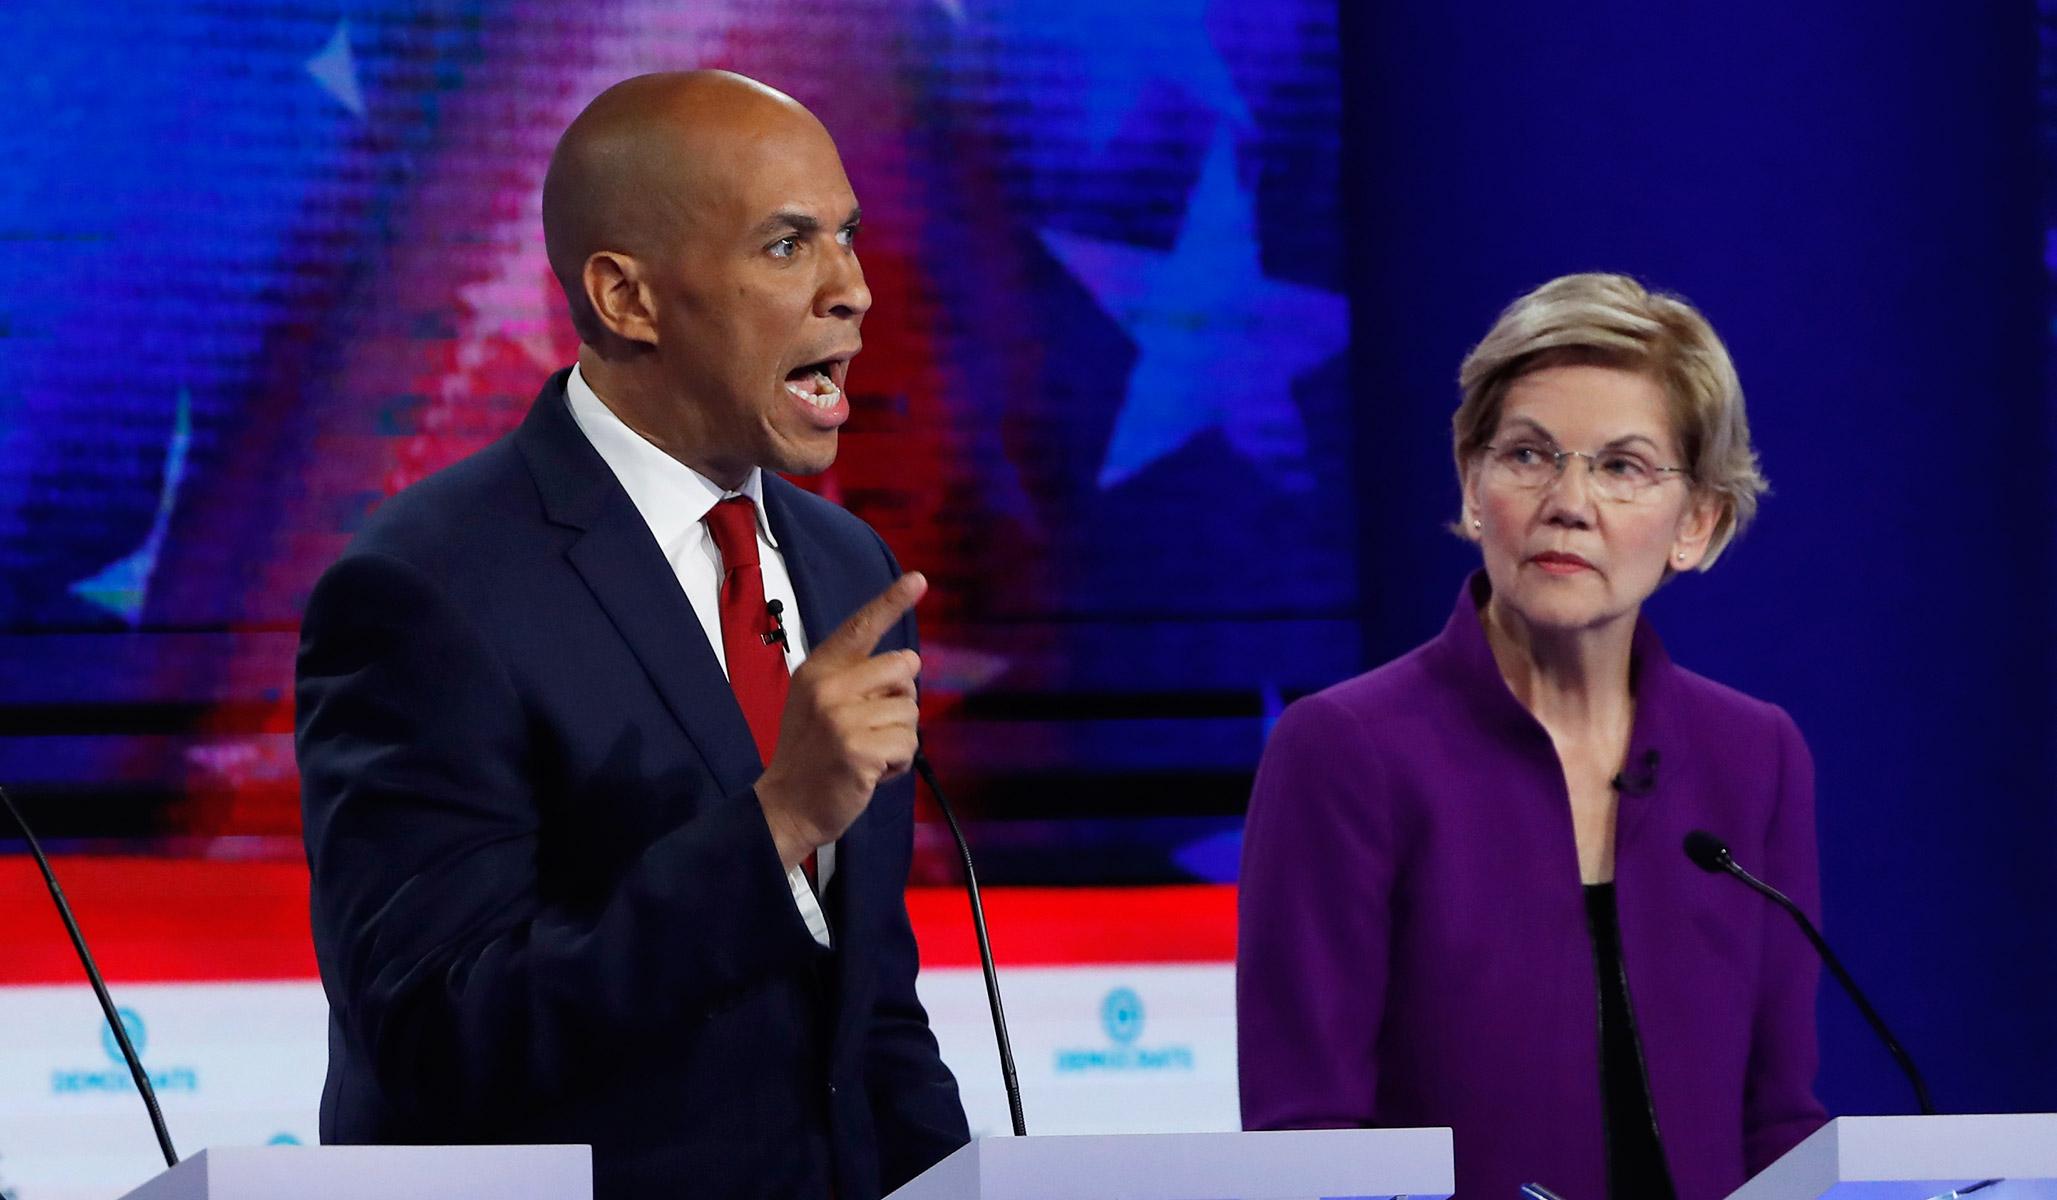 Dem Candidates Call to Investigate 'Toxic Culture' at NBC Ahead of MSNBC Debate